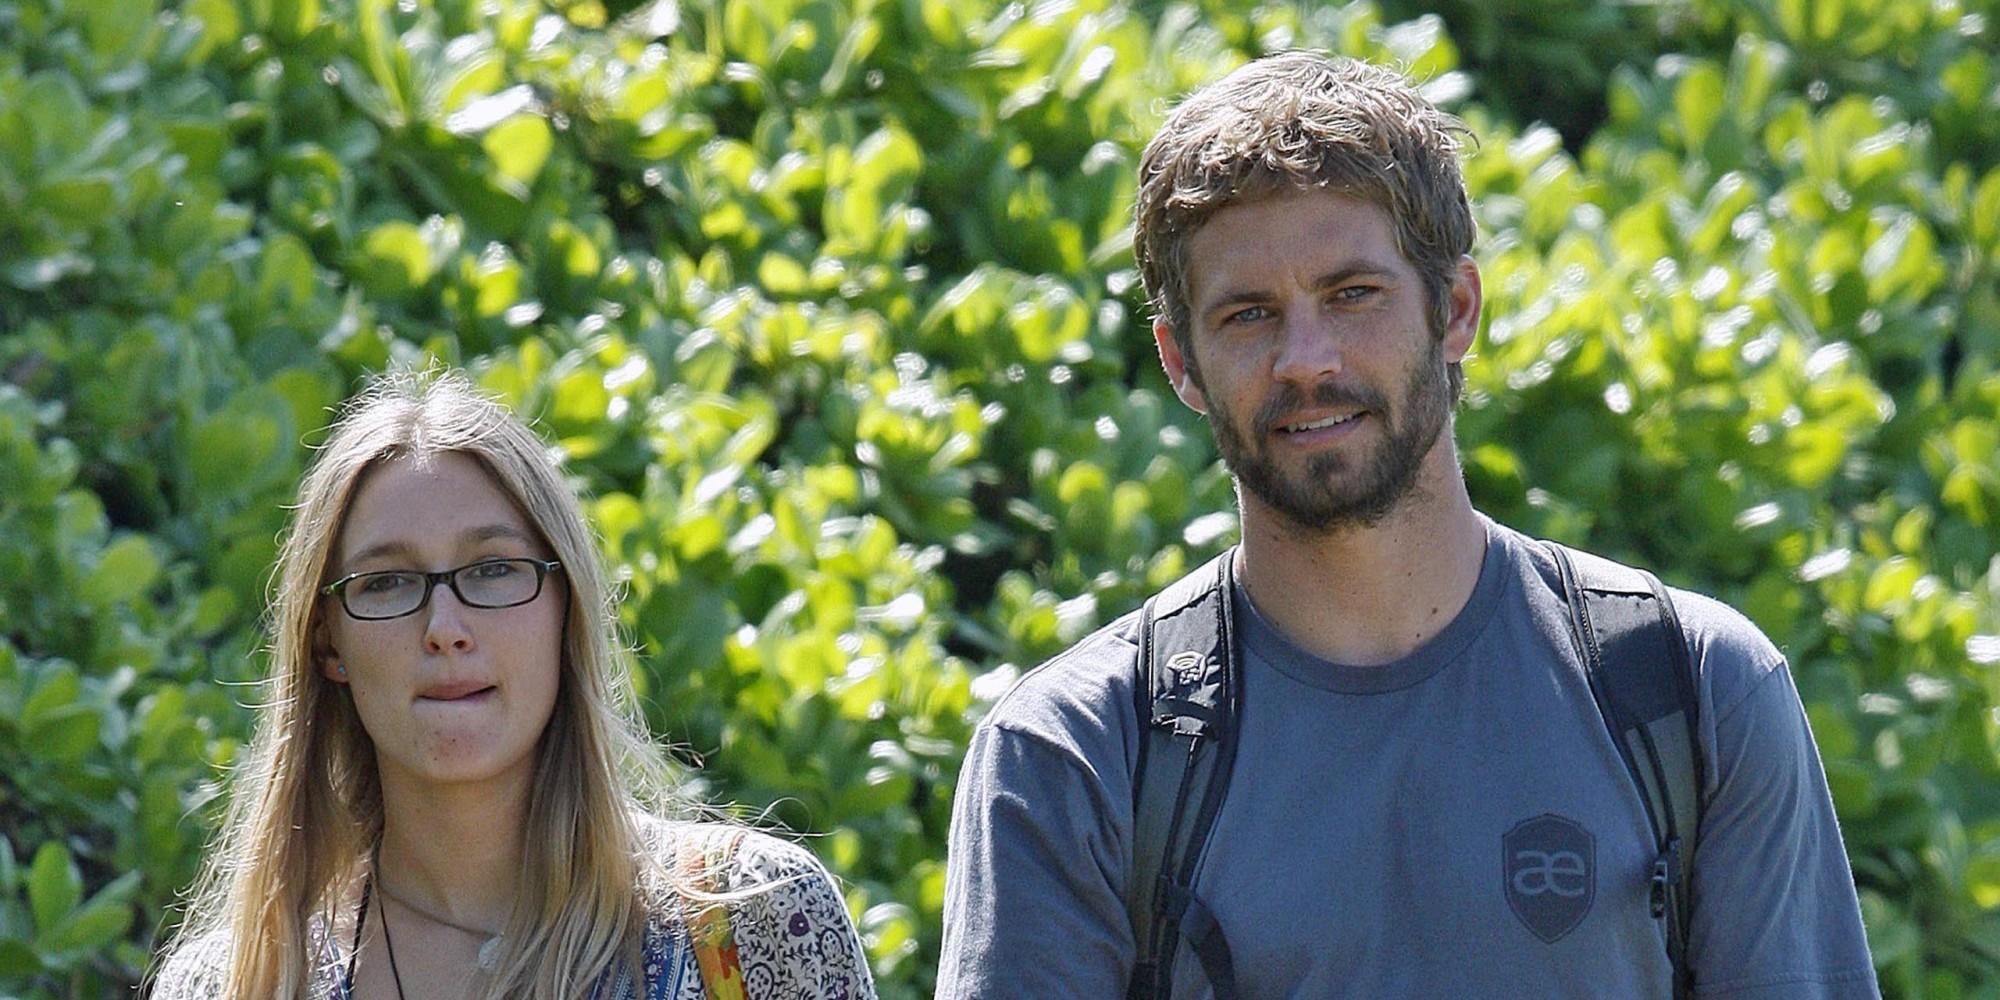 how did paul walker meet his girlfriend jasmine pilchard gosnell